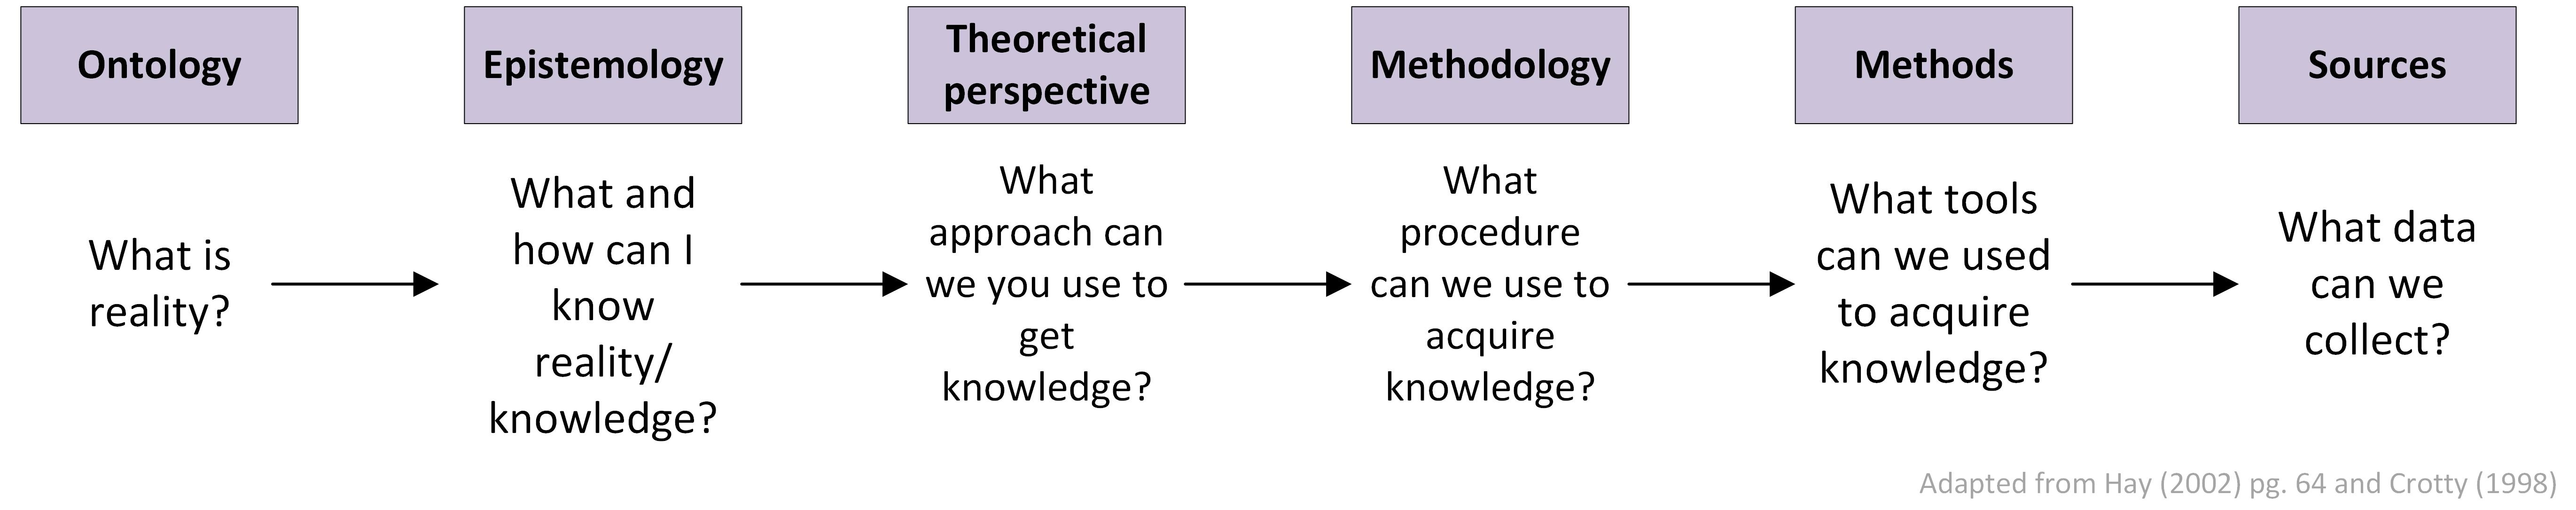 ontology and epistemology relationship marketing